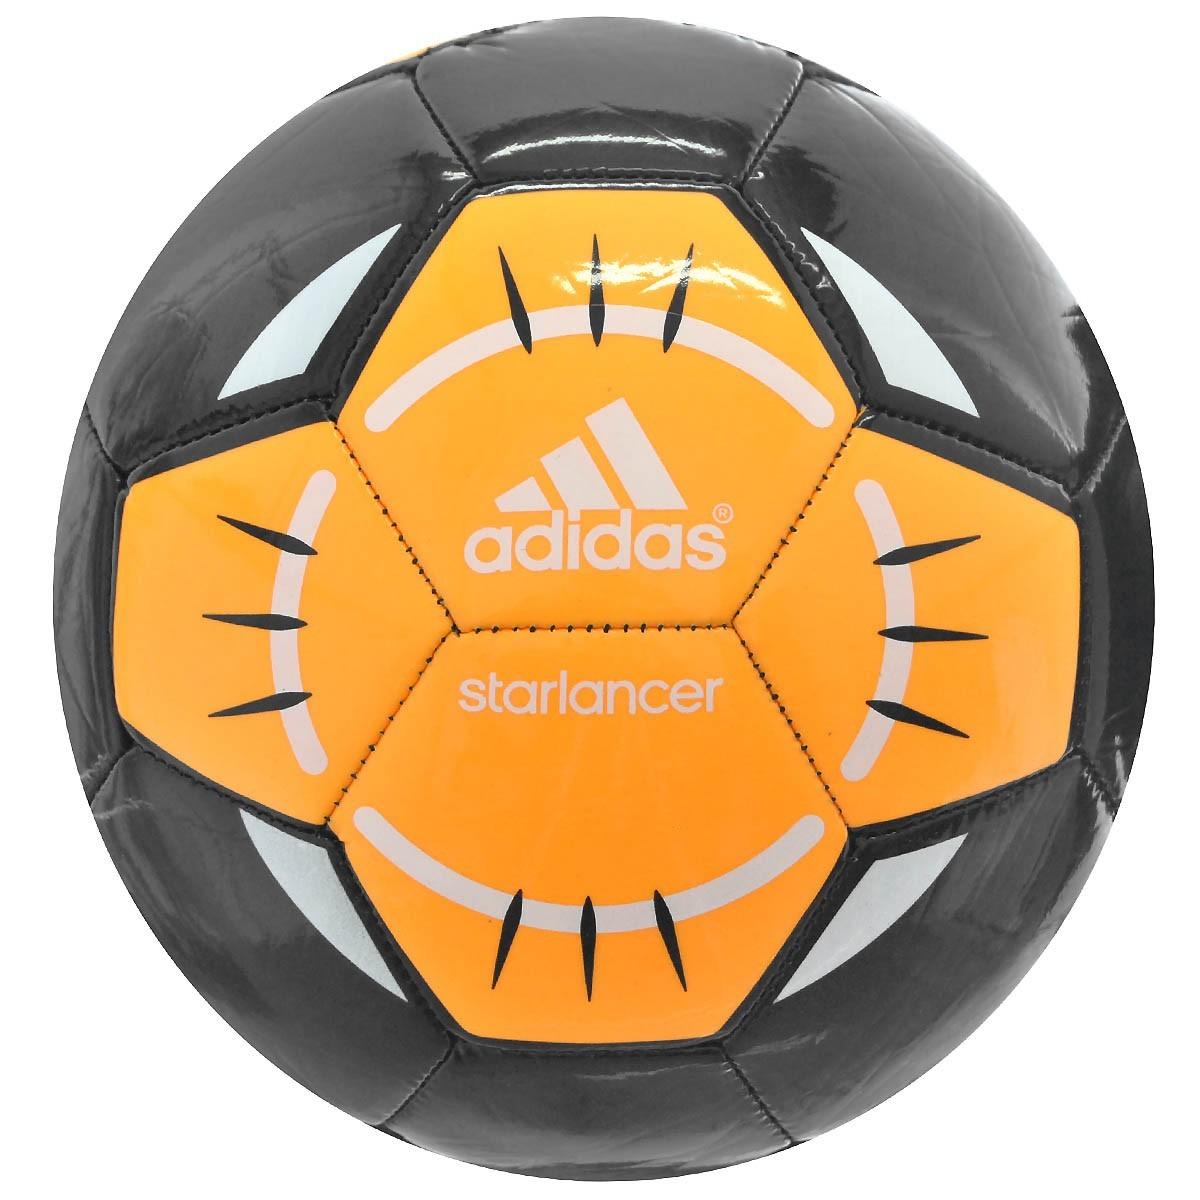 Bizz Store - Bola Futebol de Campo Adidas Starlancer 4 F93745 a2ec45038821d